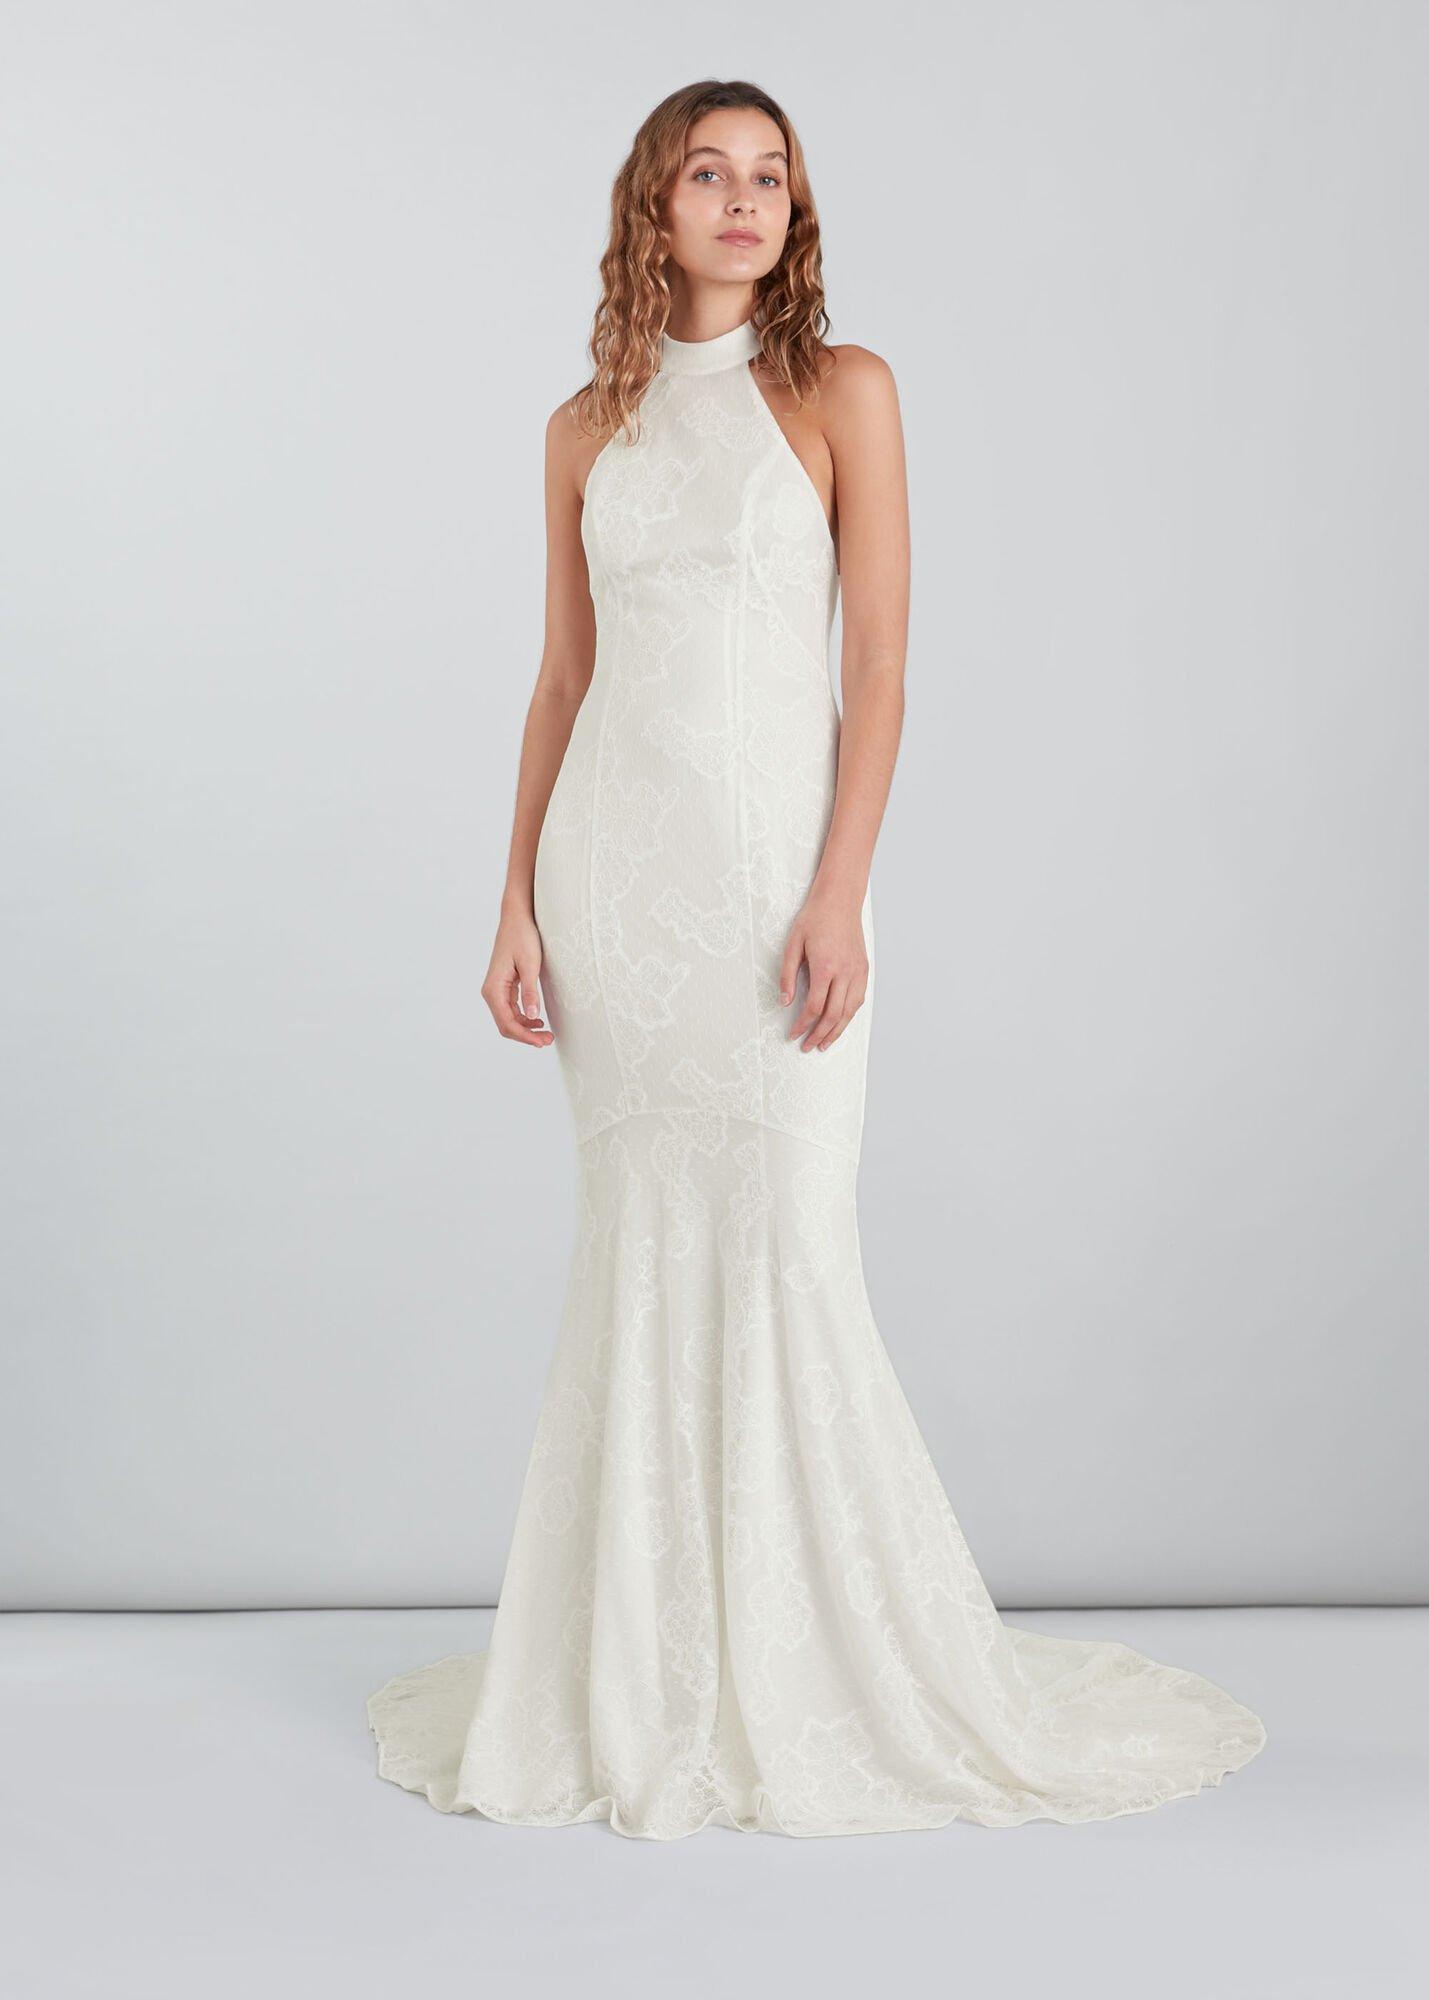 Maria Halter Wedding Dress